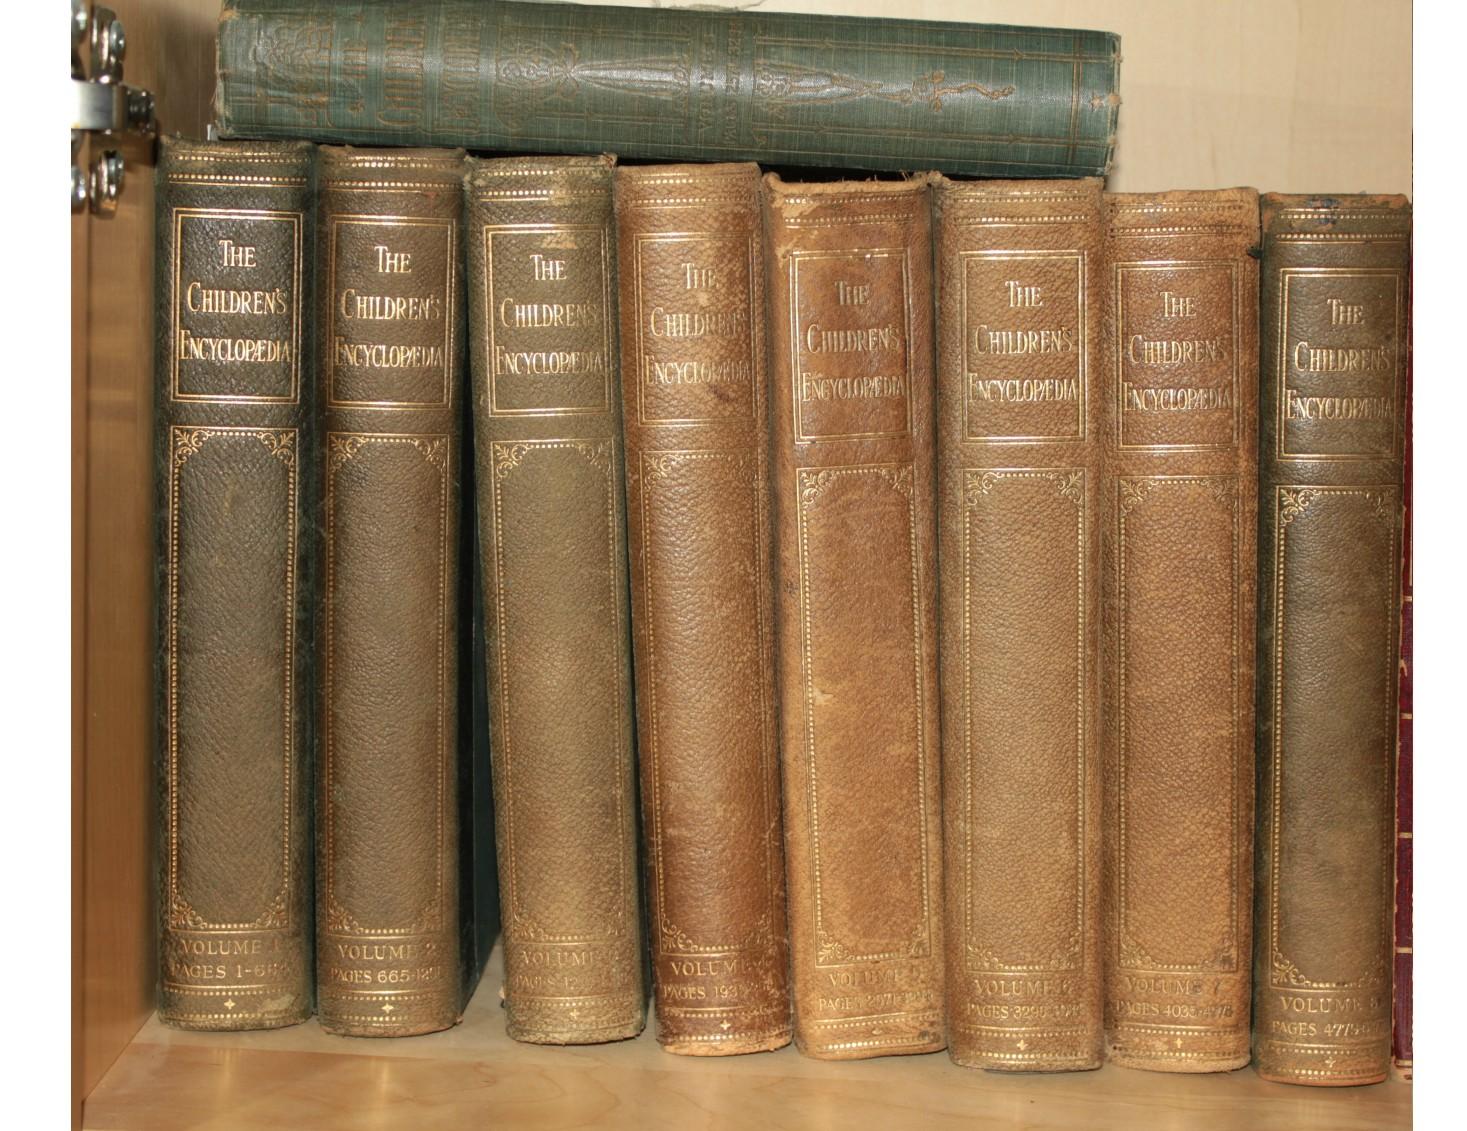 BOOKS OF WONDER - THE JOY OF OLD ENCYCLOPEDIAS